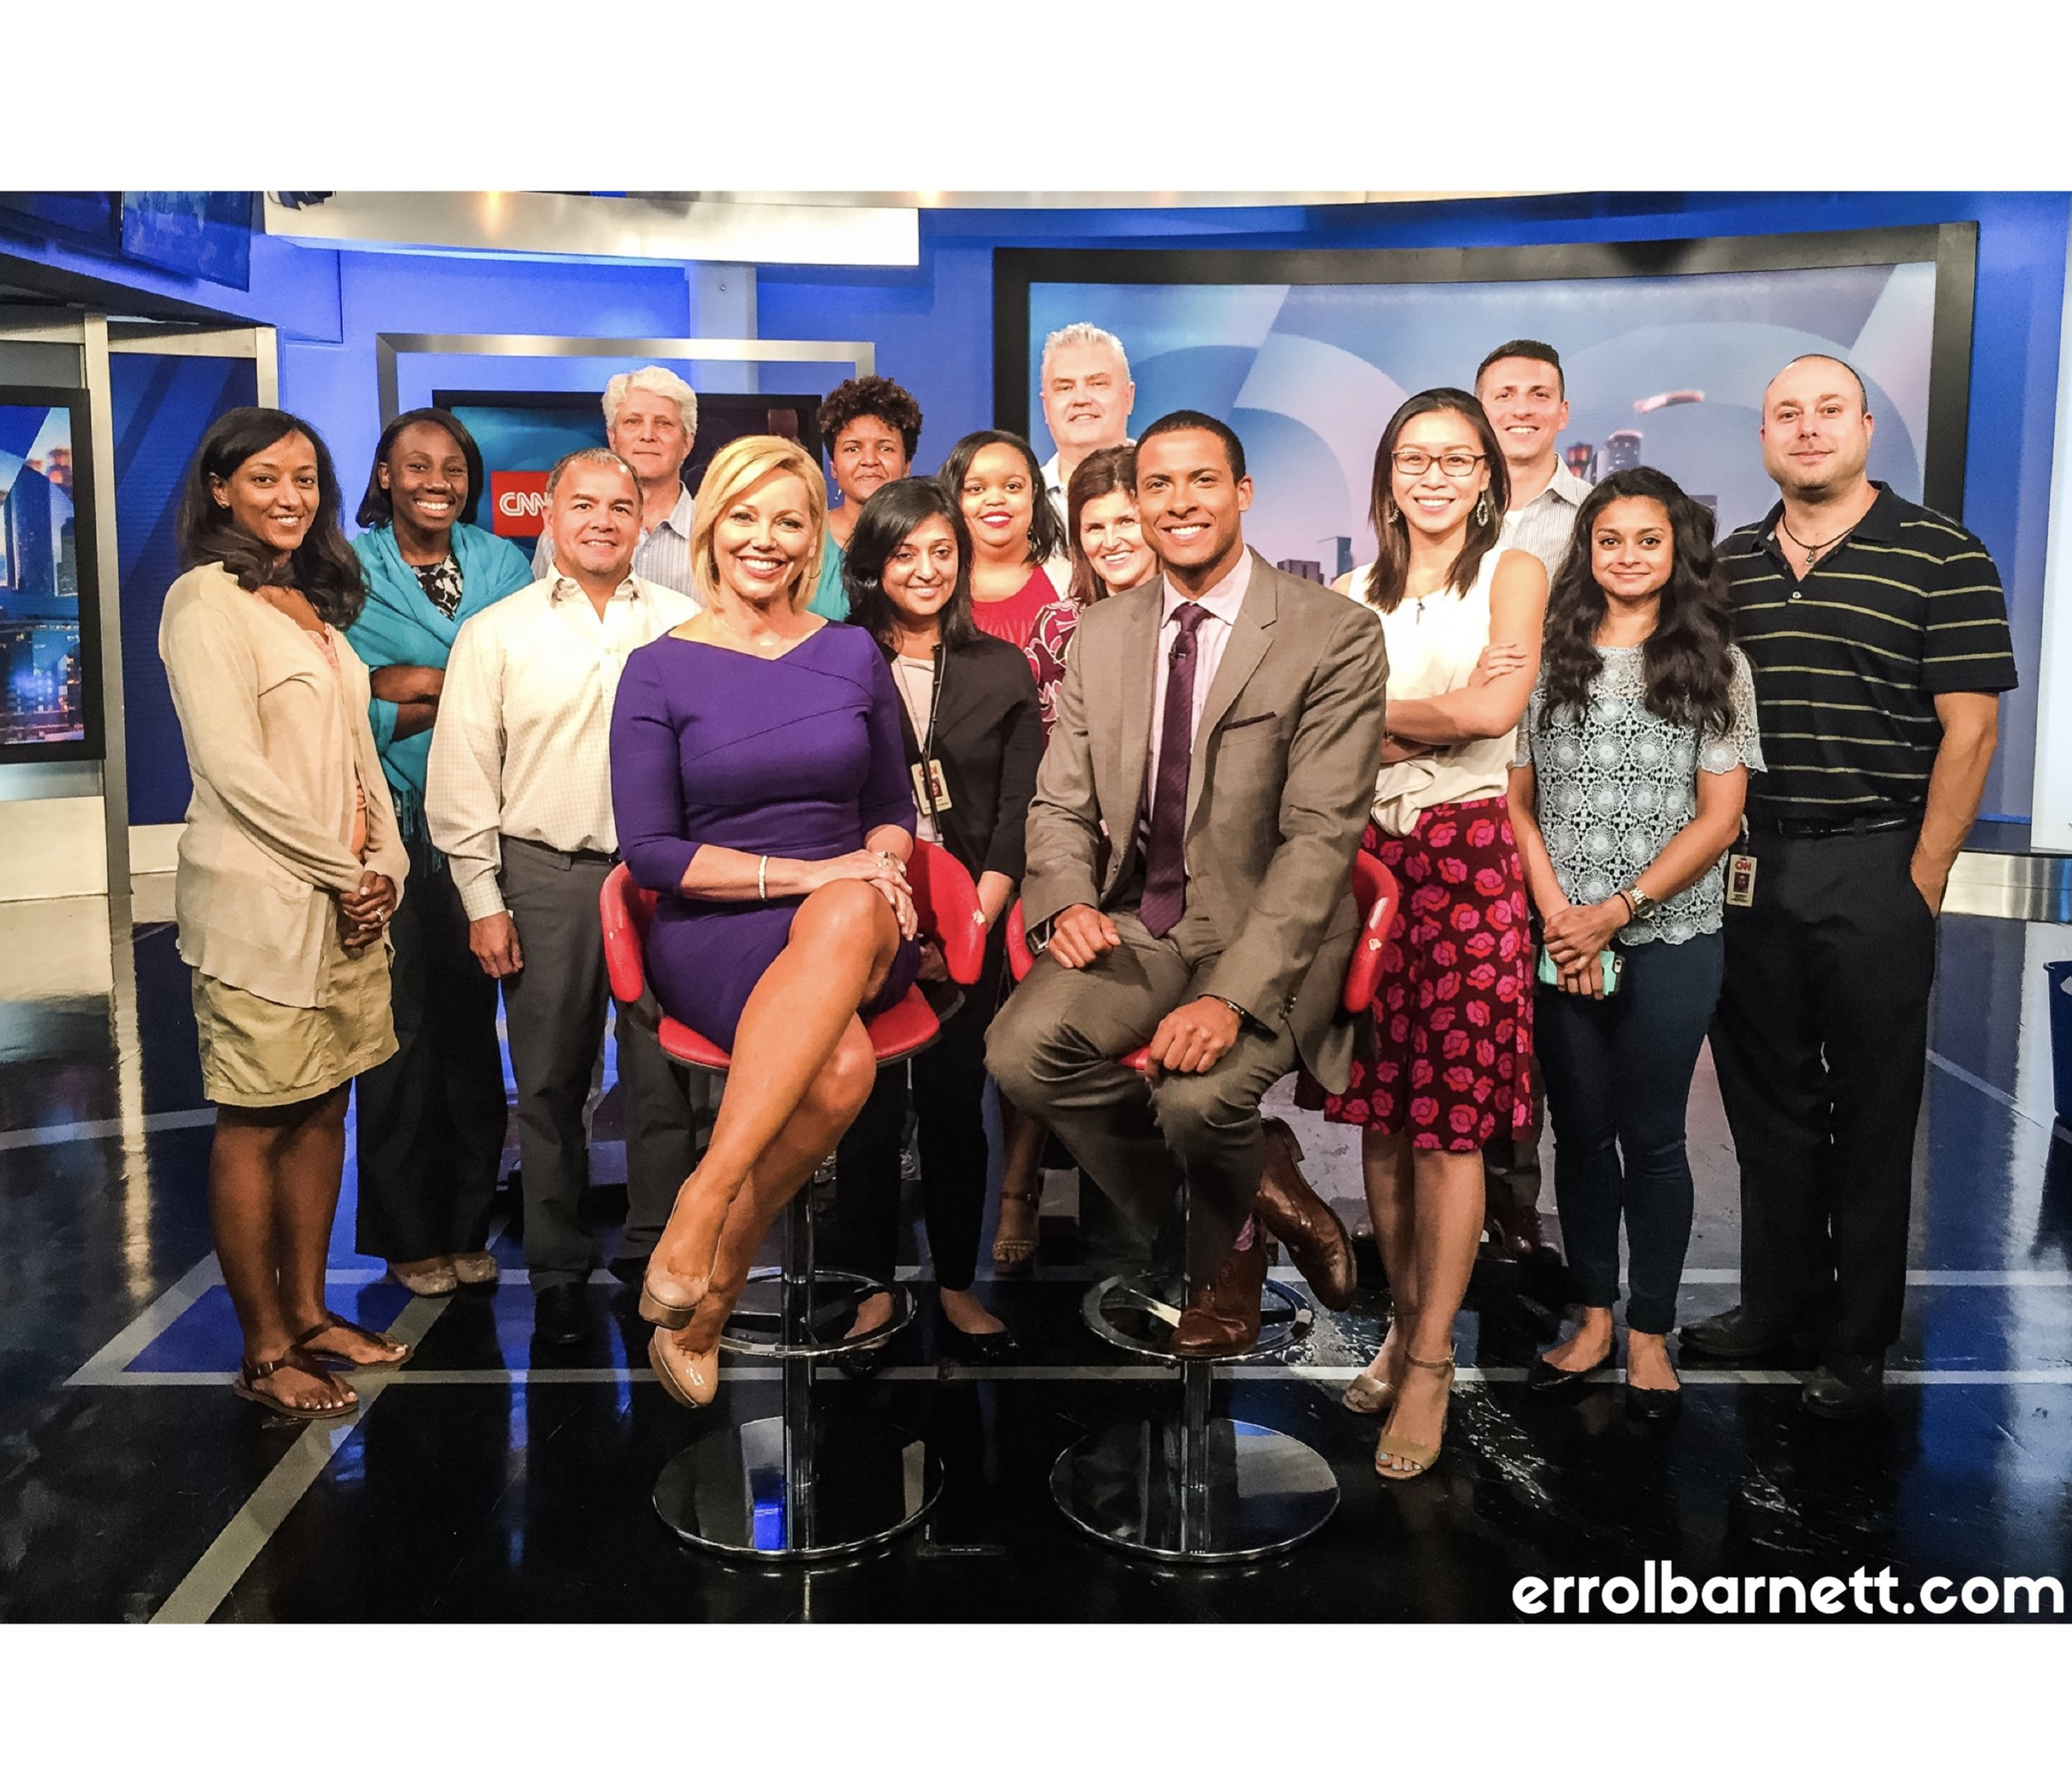 the cnn newsroom team